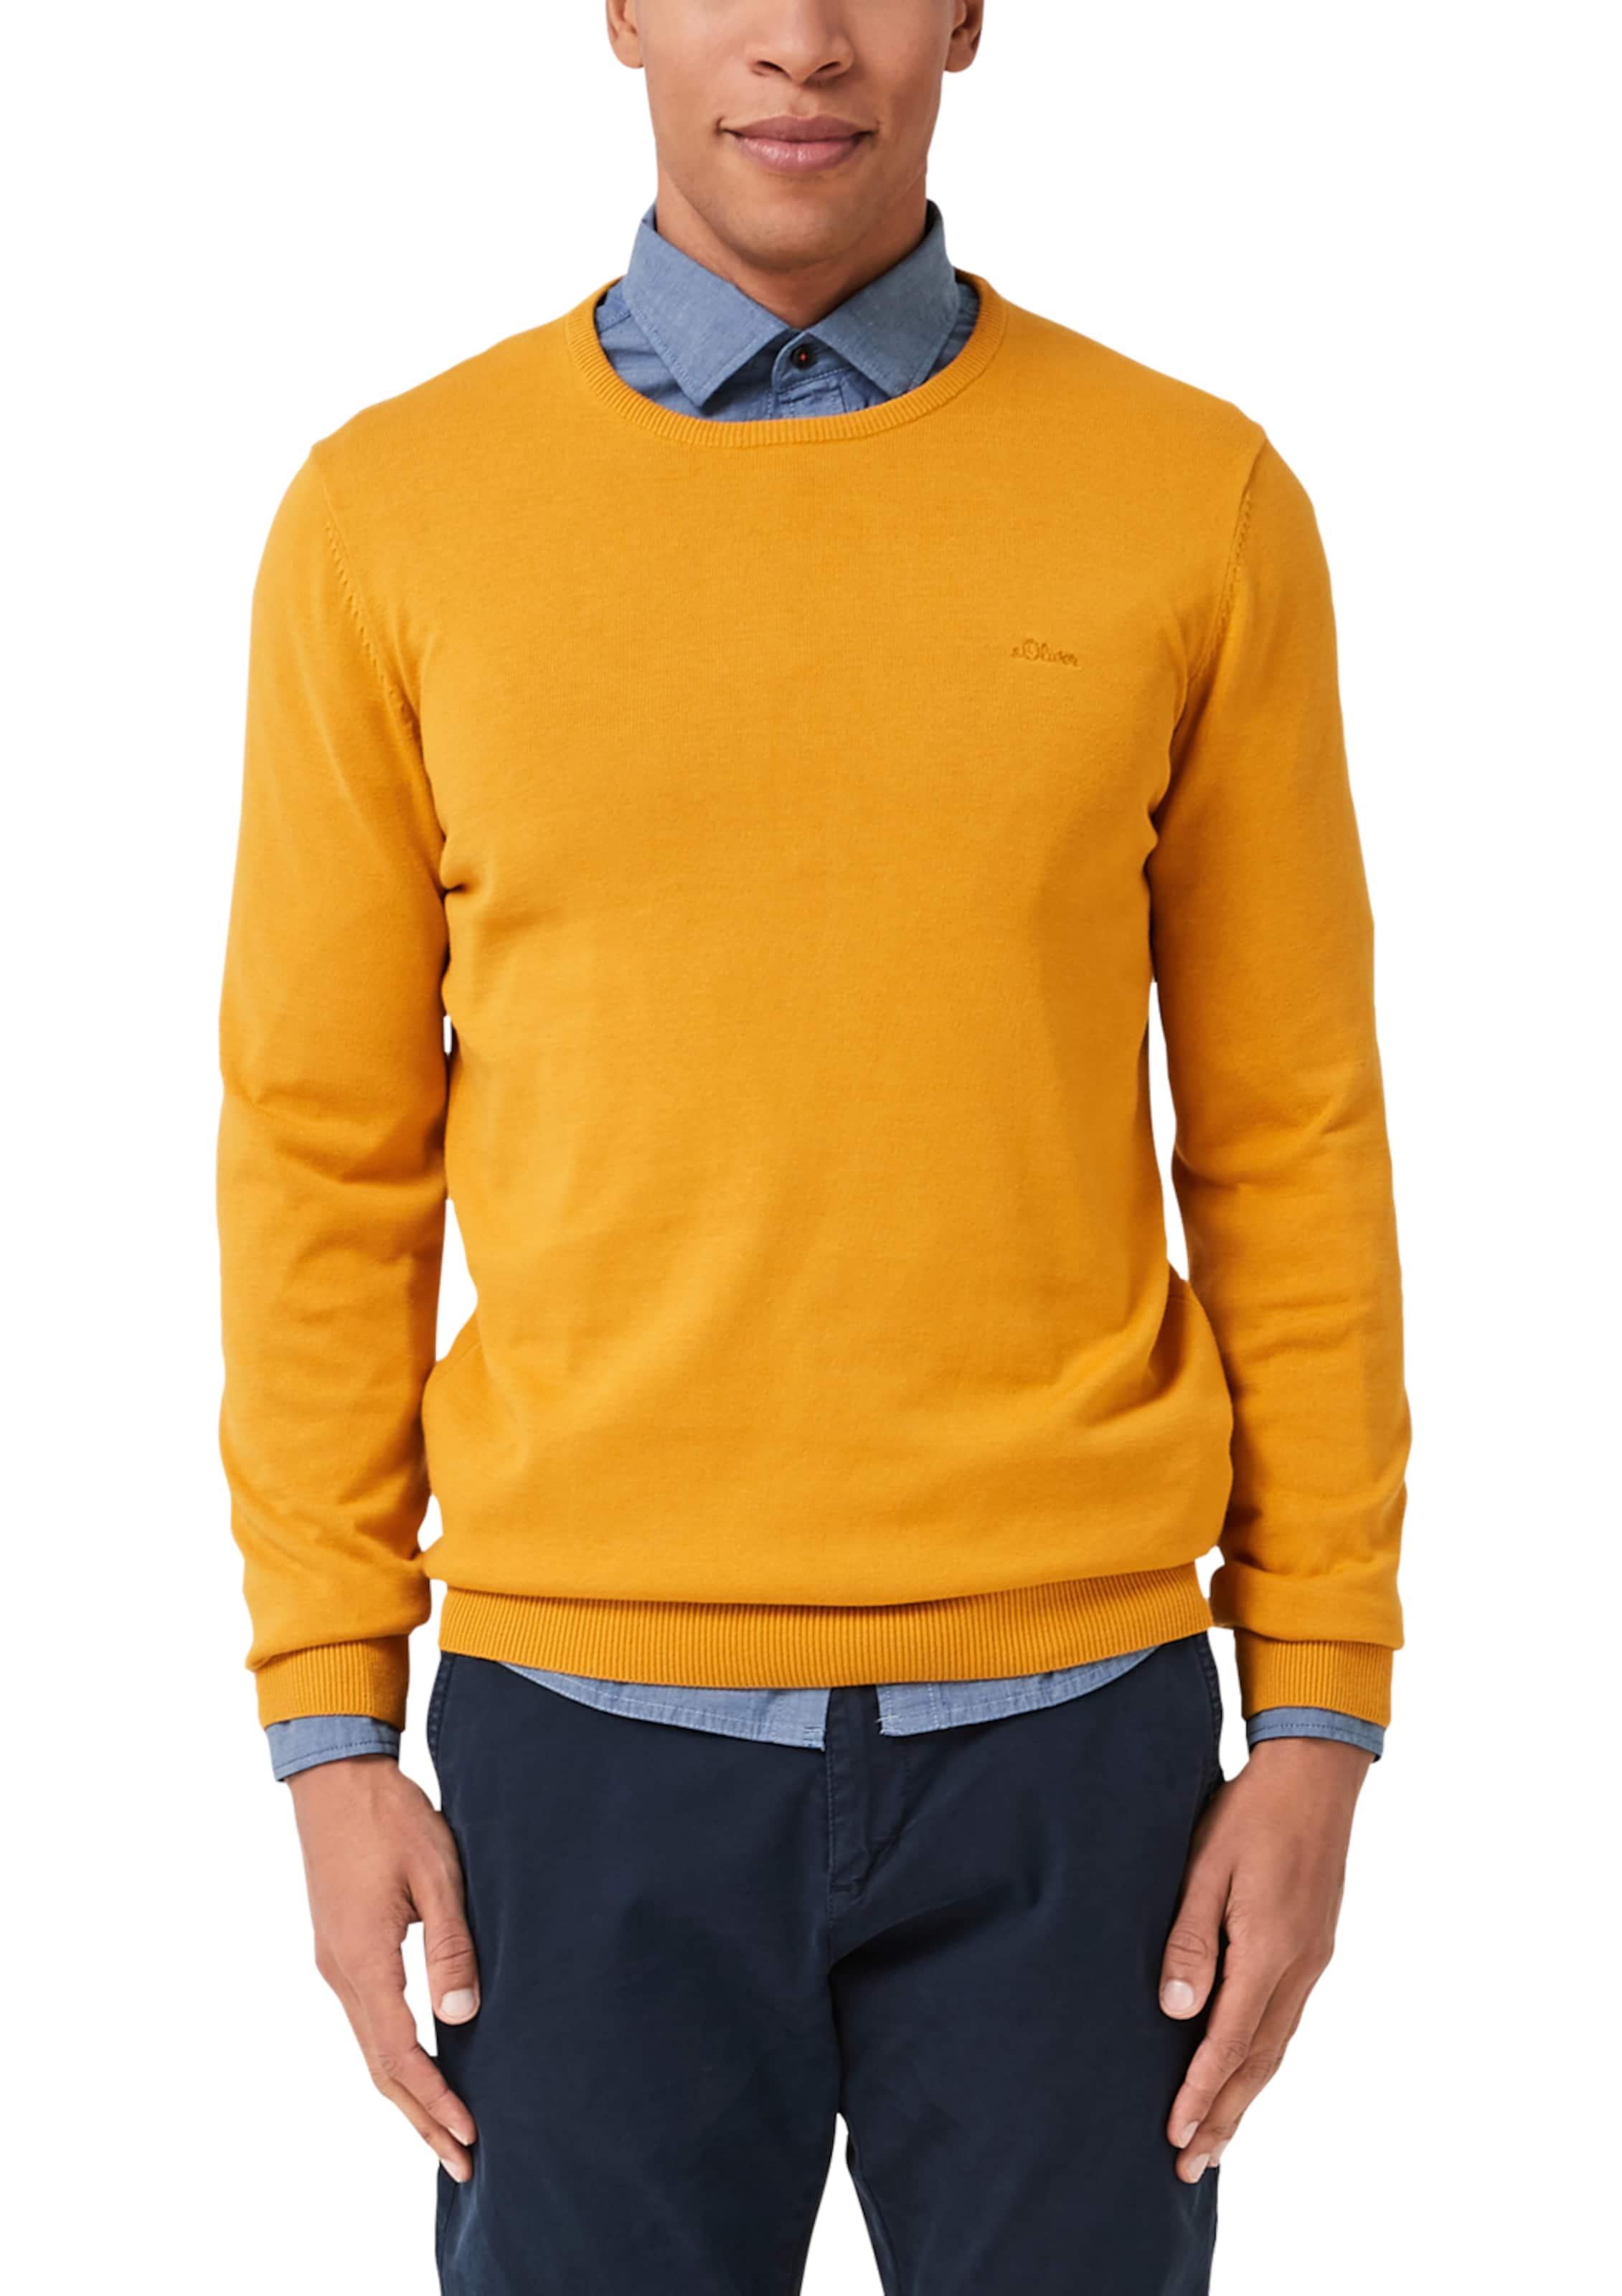 S Red Gelb In Mit Neck Label Pullover oliver Crew tQdshrC